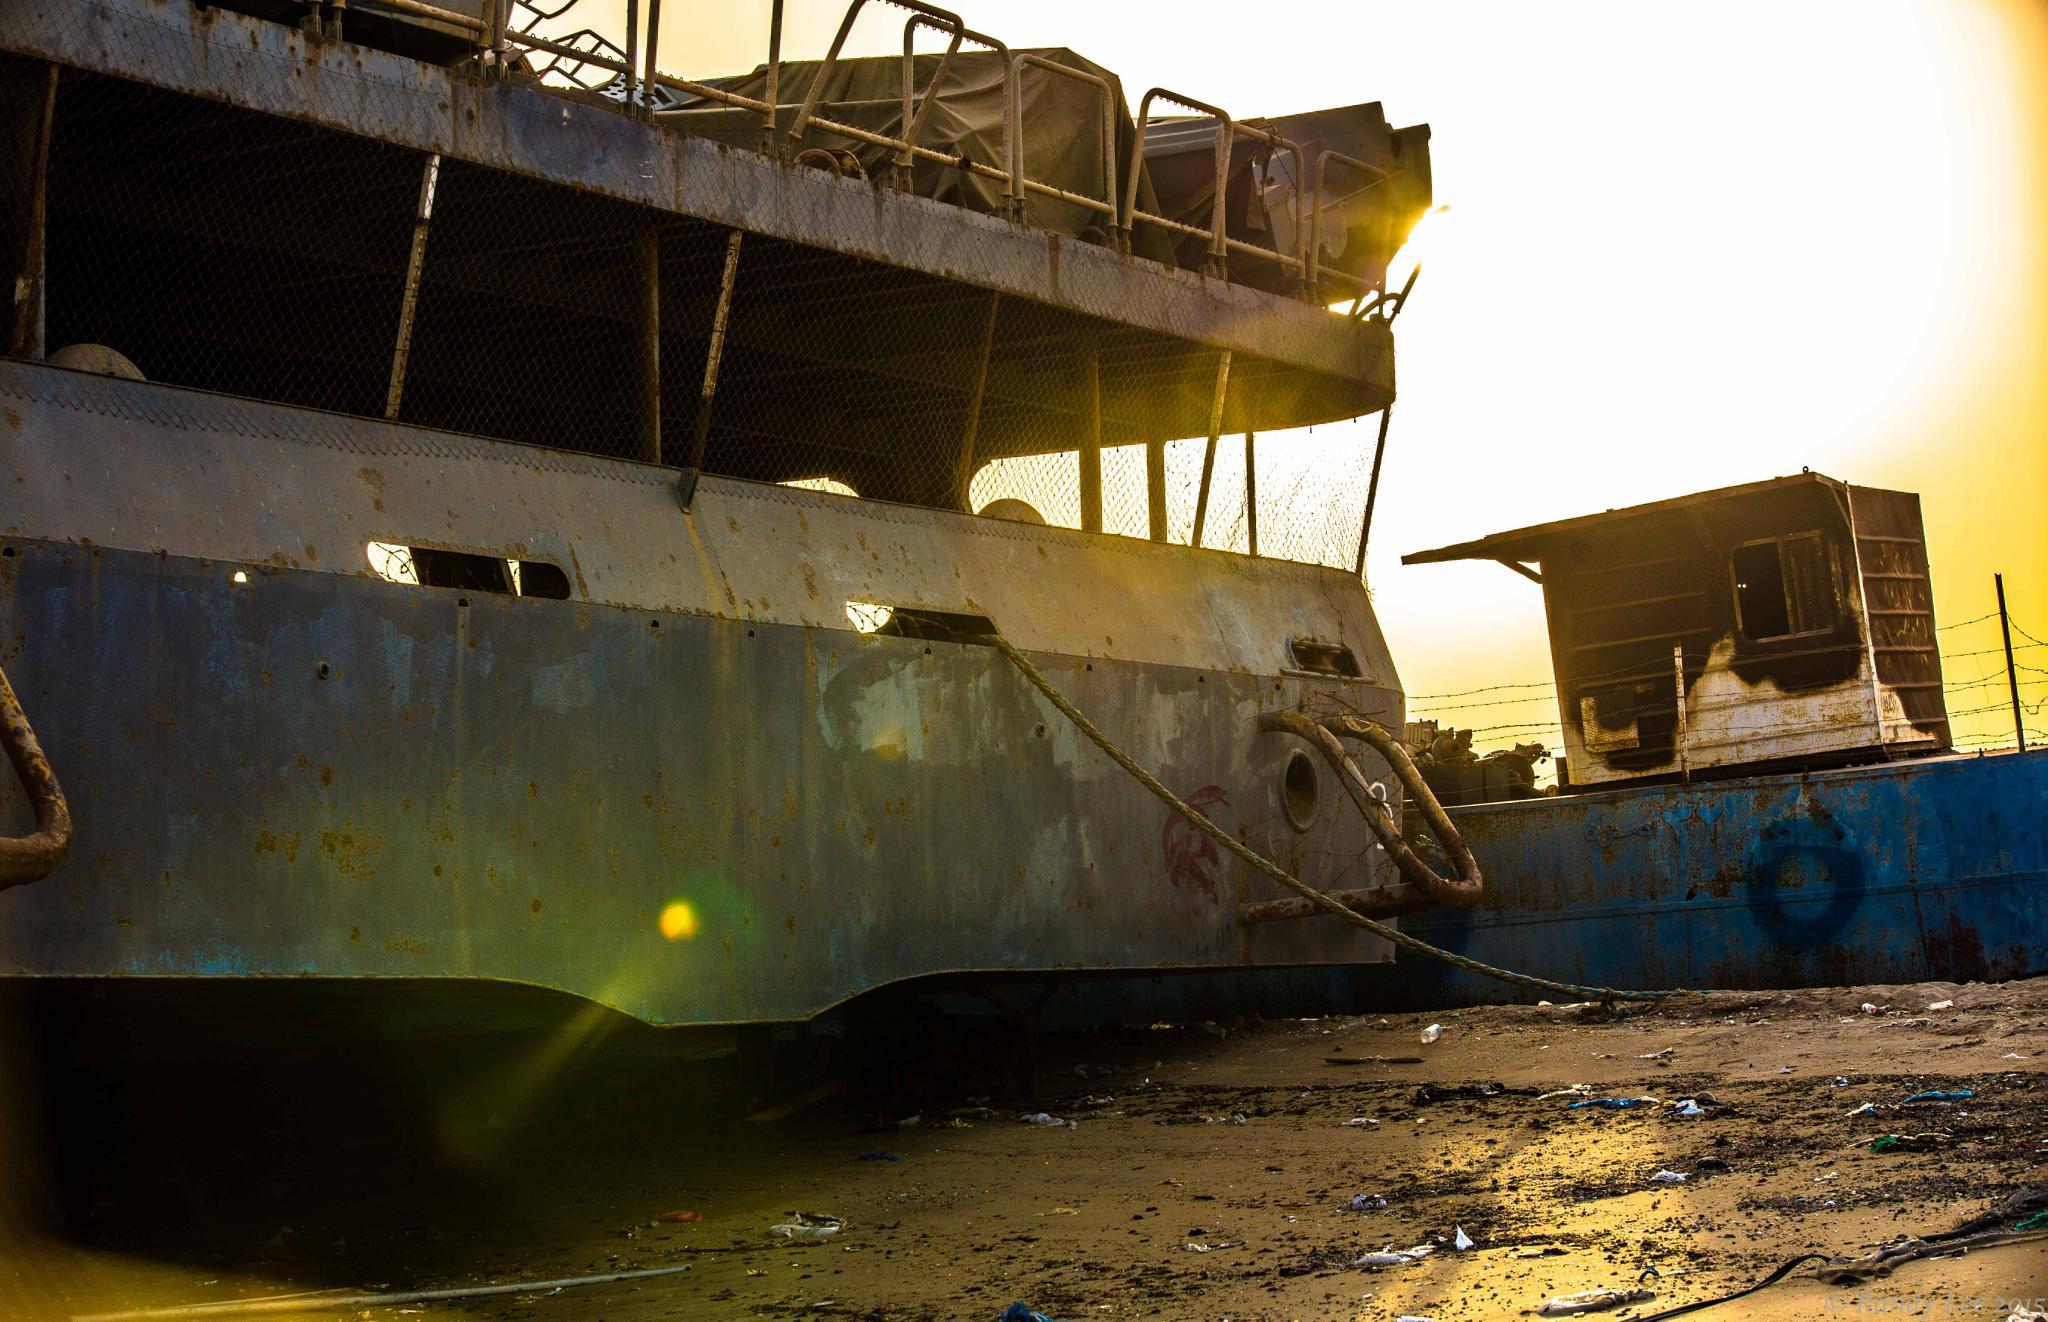 abandoned ships_al doha kuwait by Randy